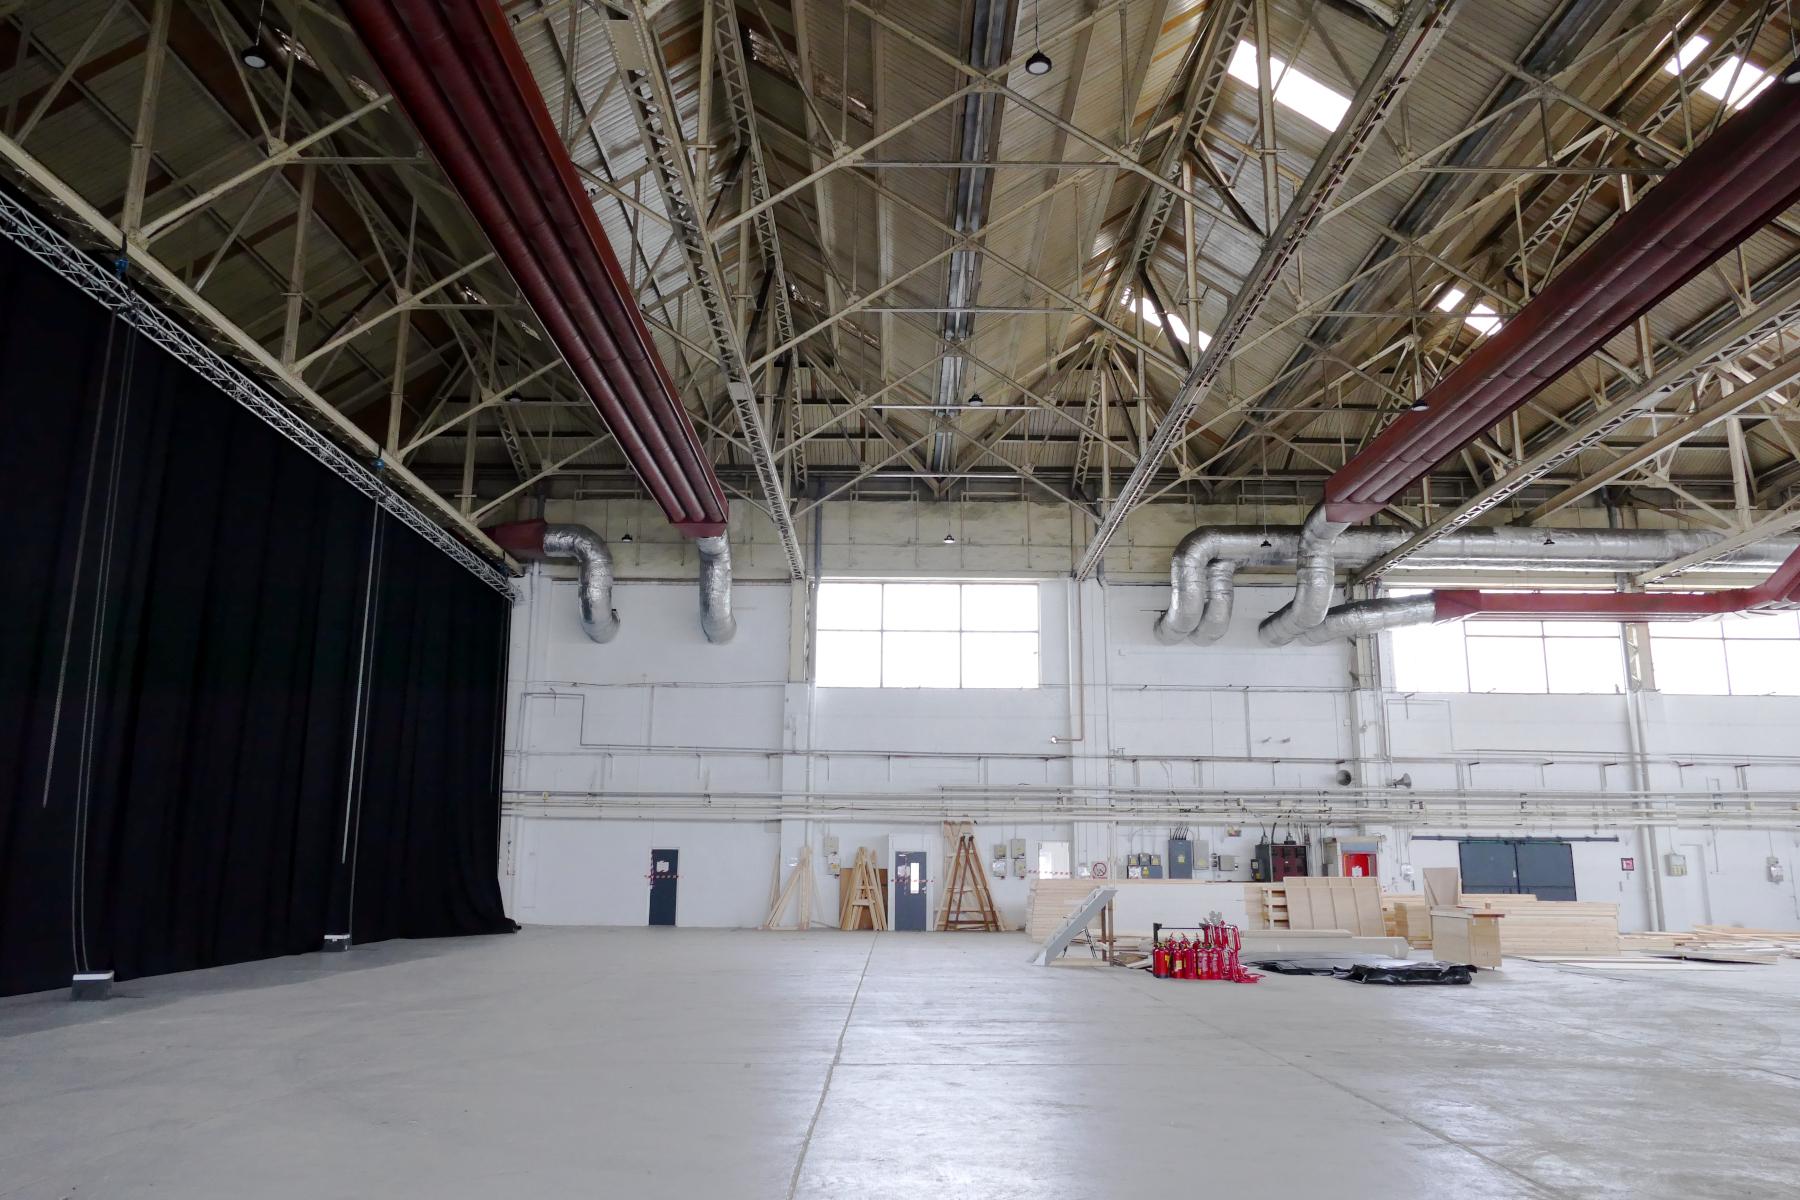 050_hangar_interior